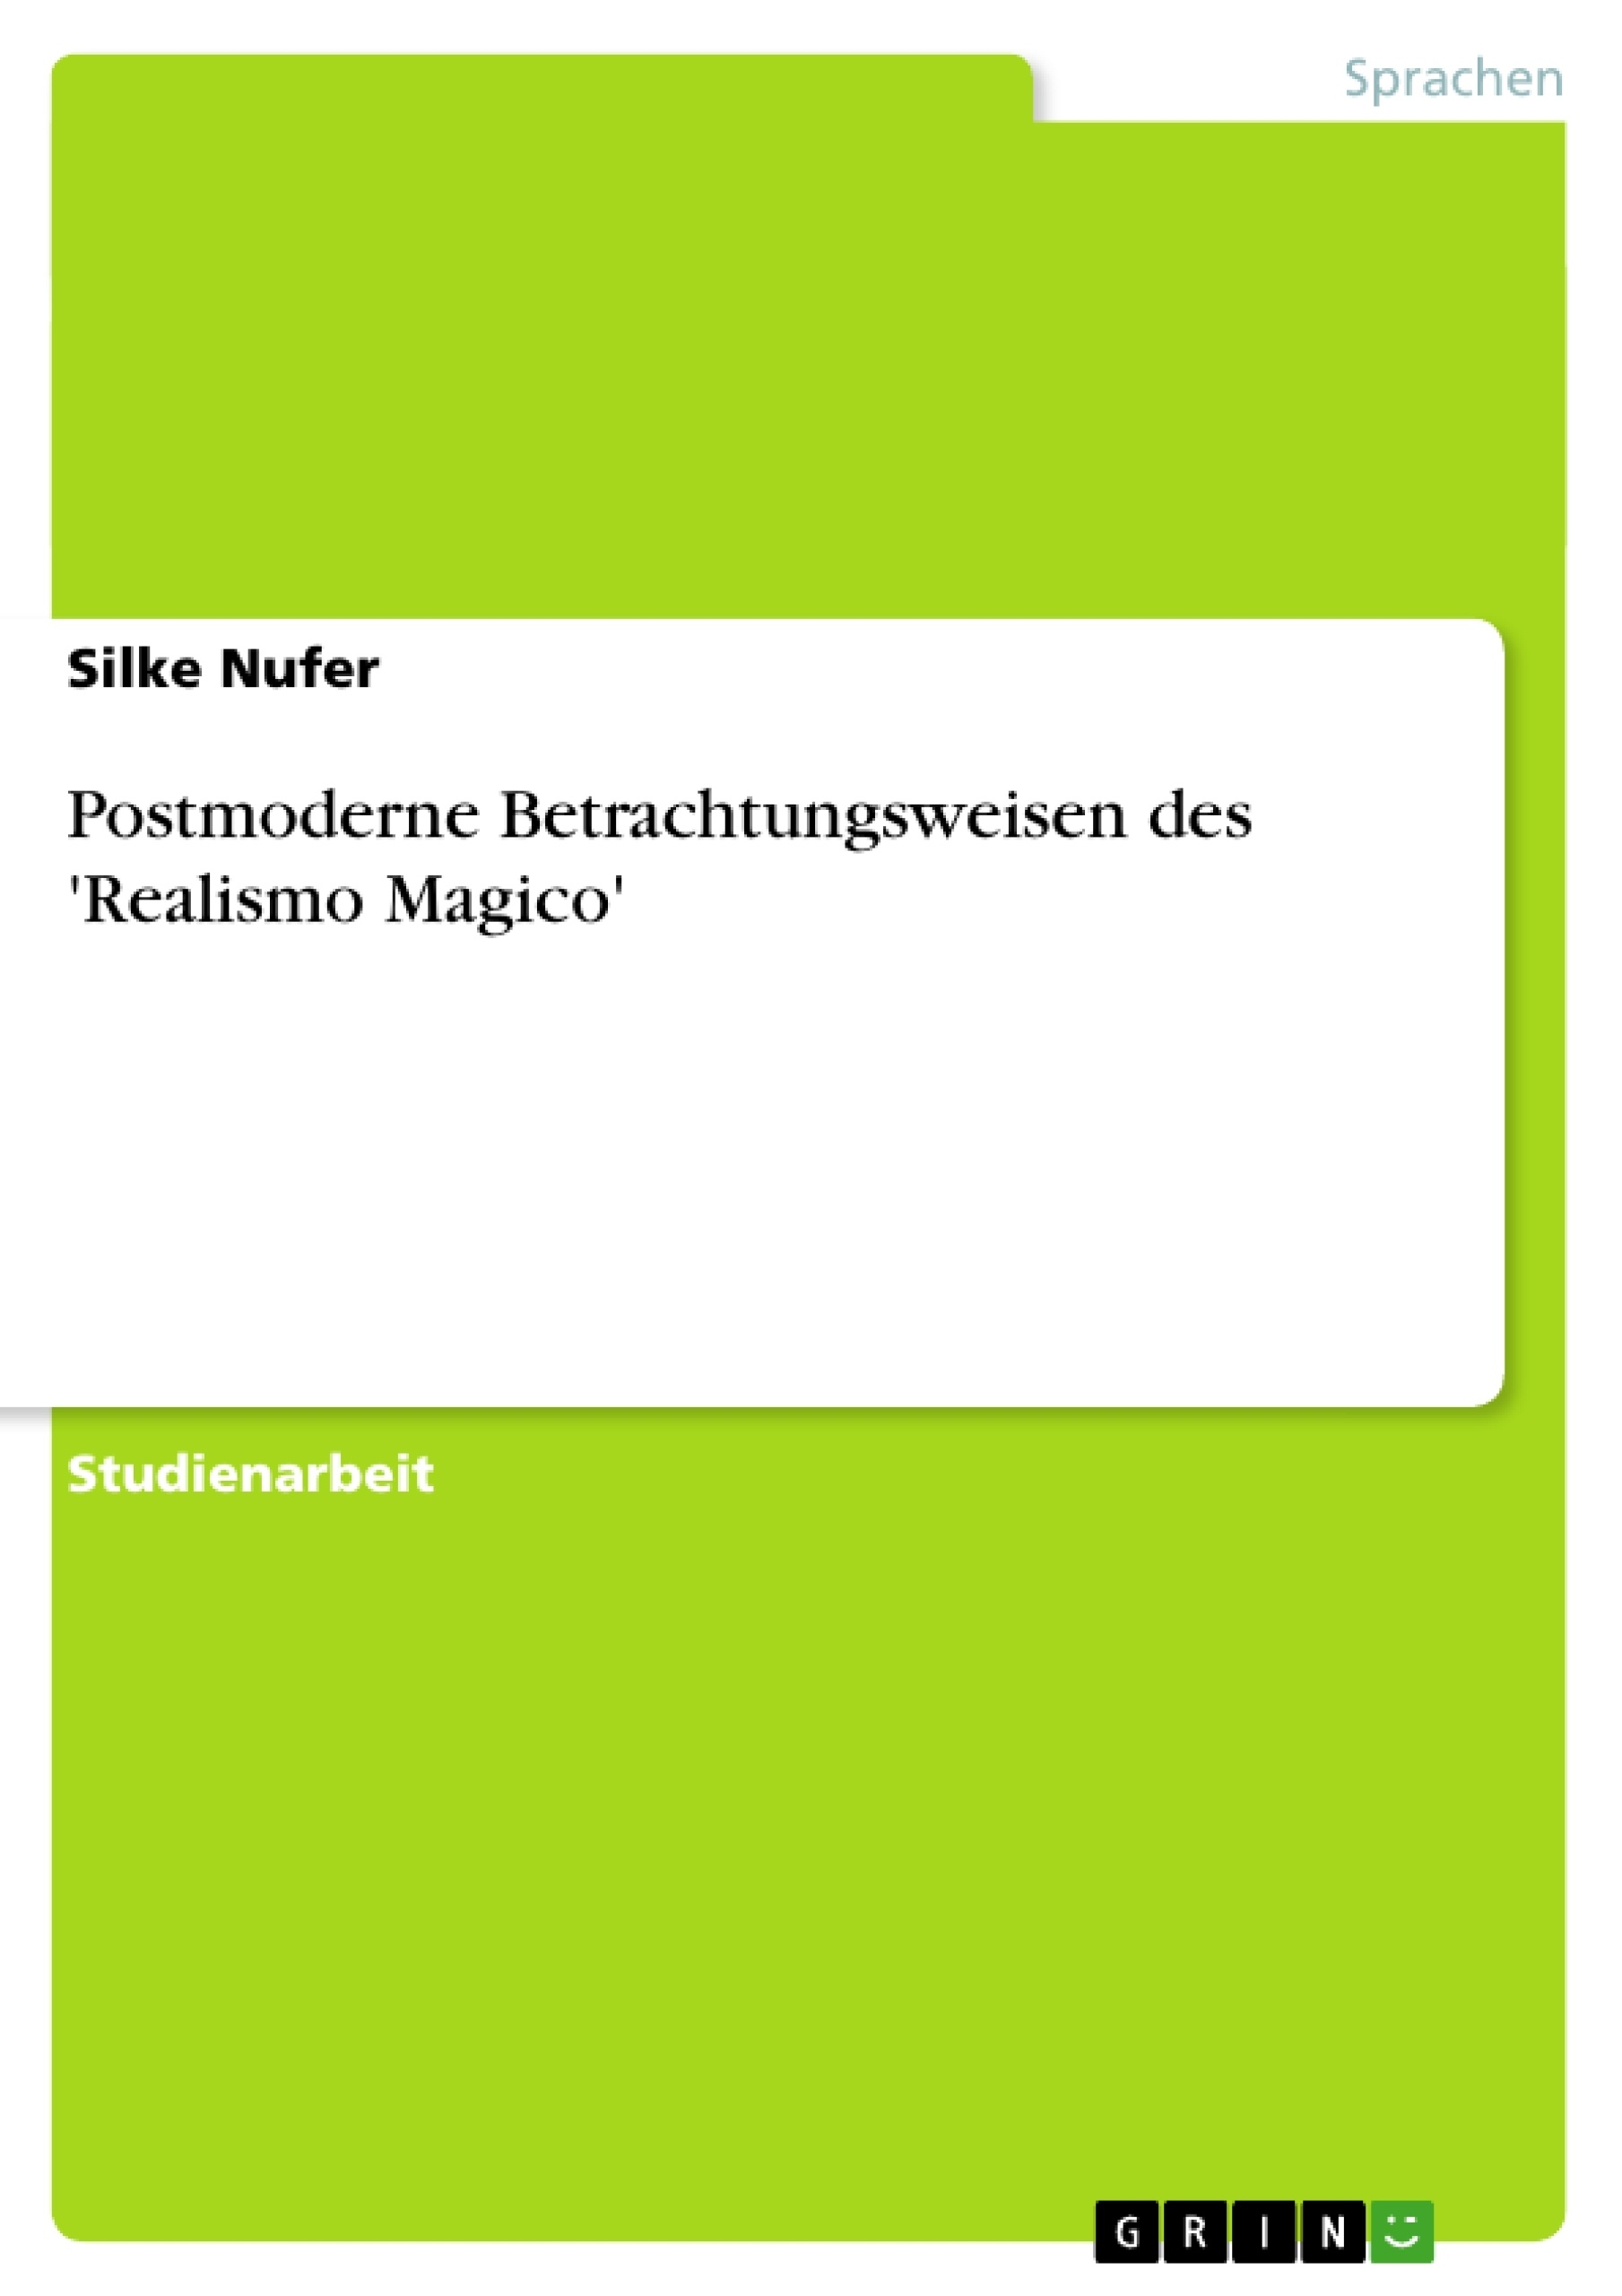 Titel: Postmoderne Betrachtungsweisen des 'Realismo Magico'